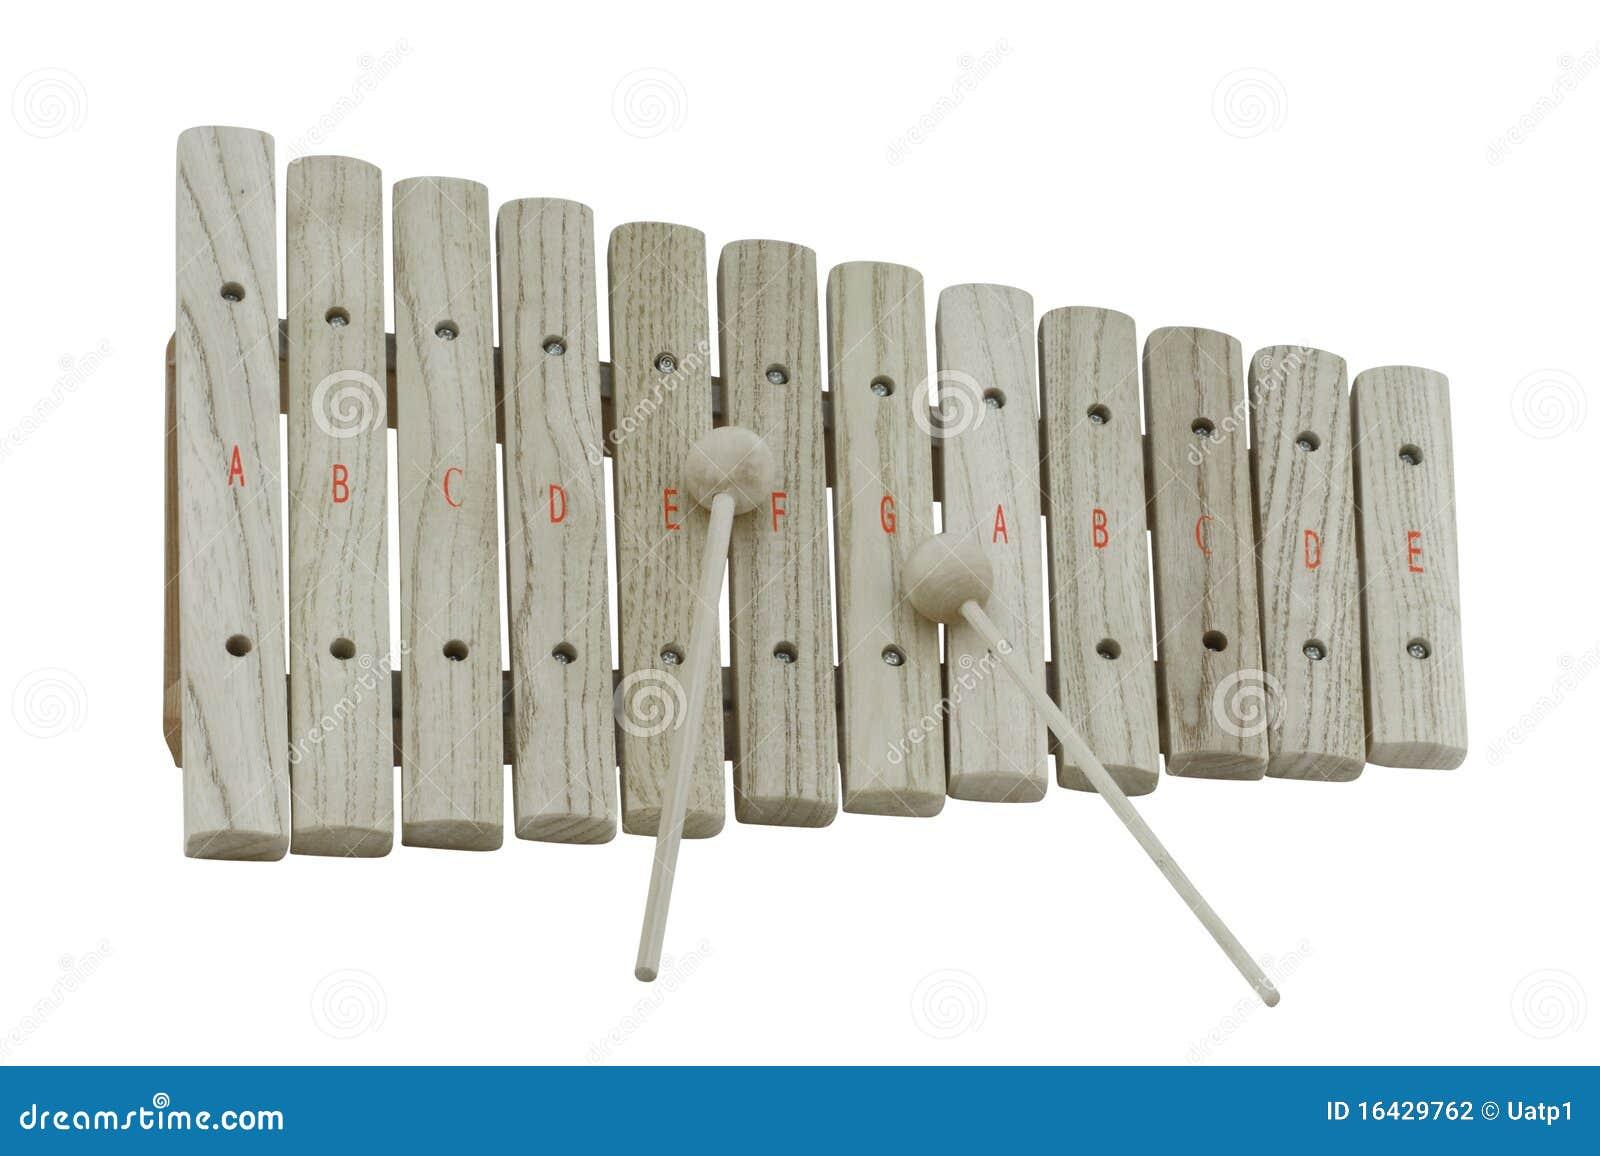 Wooden Xylophone Wooden xylophone